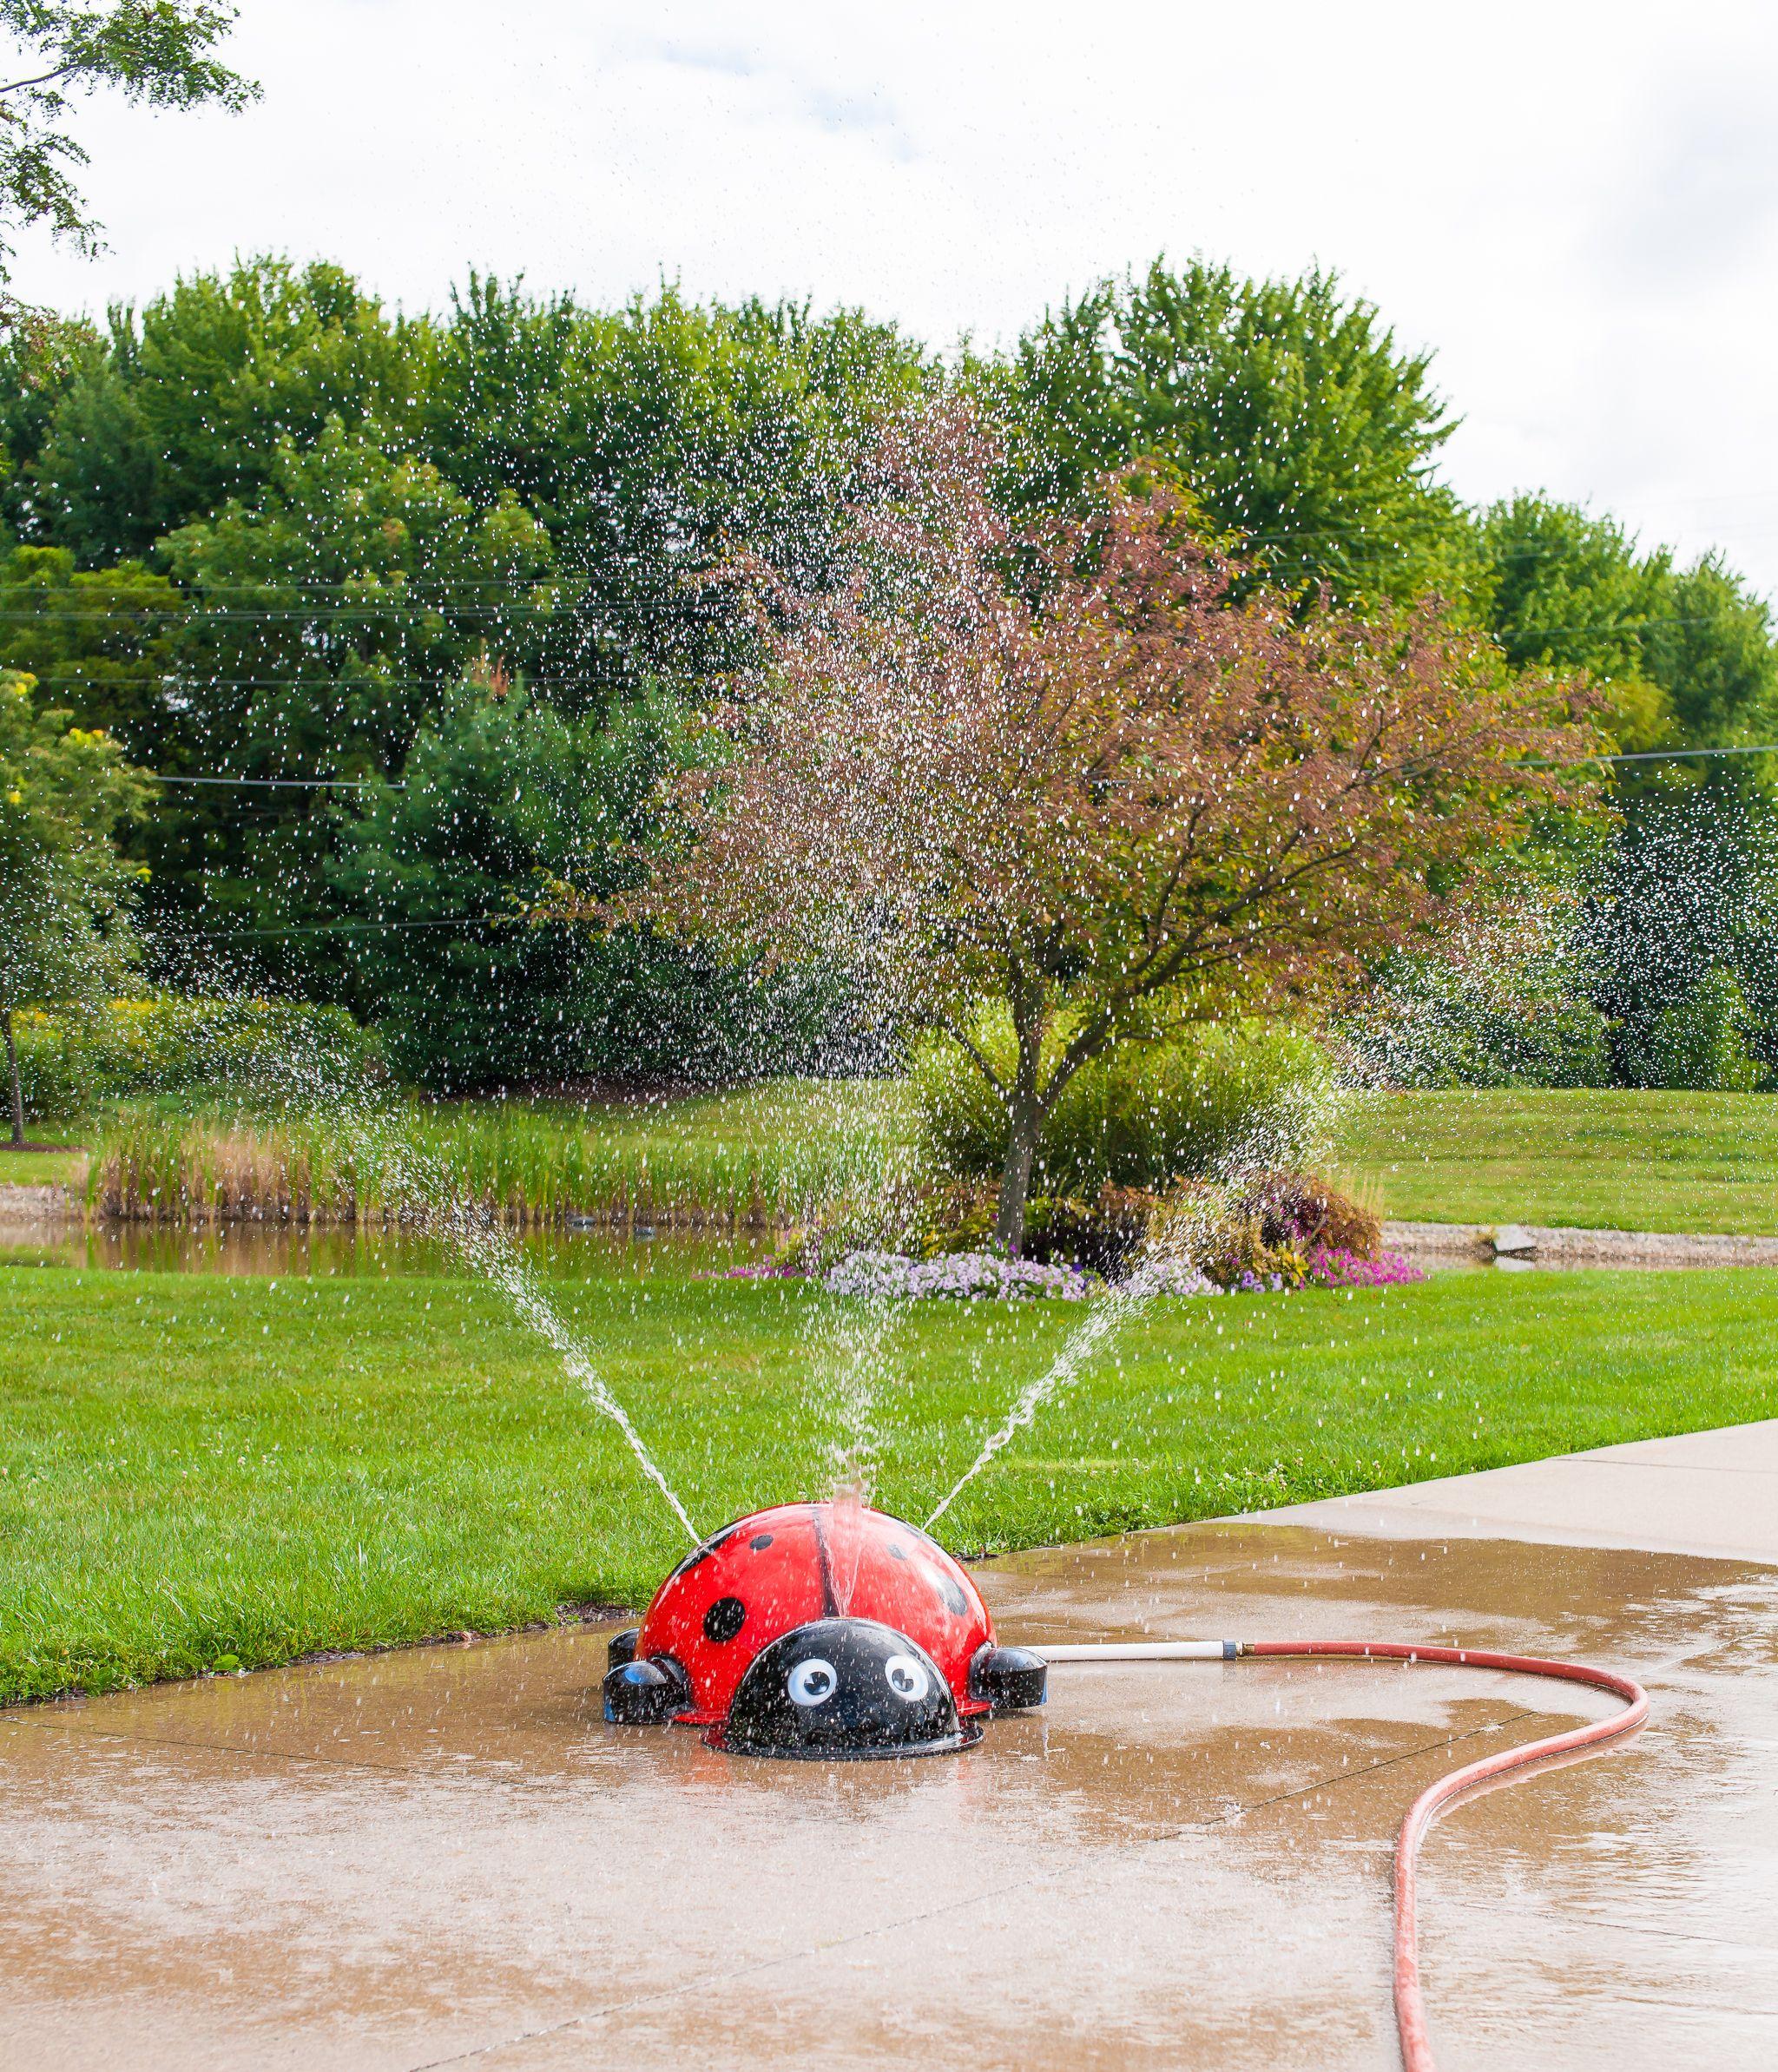 my splash pad mobile splash park cool backyard friendly idea